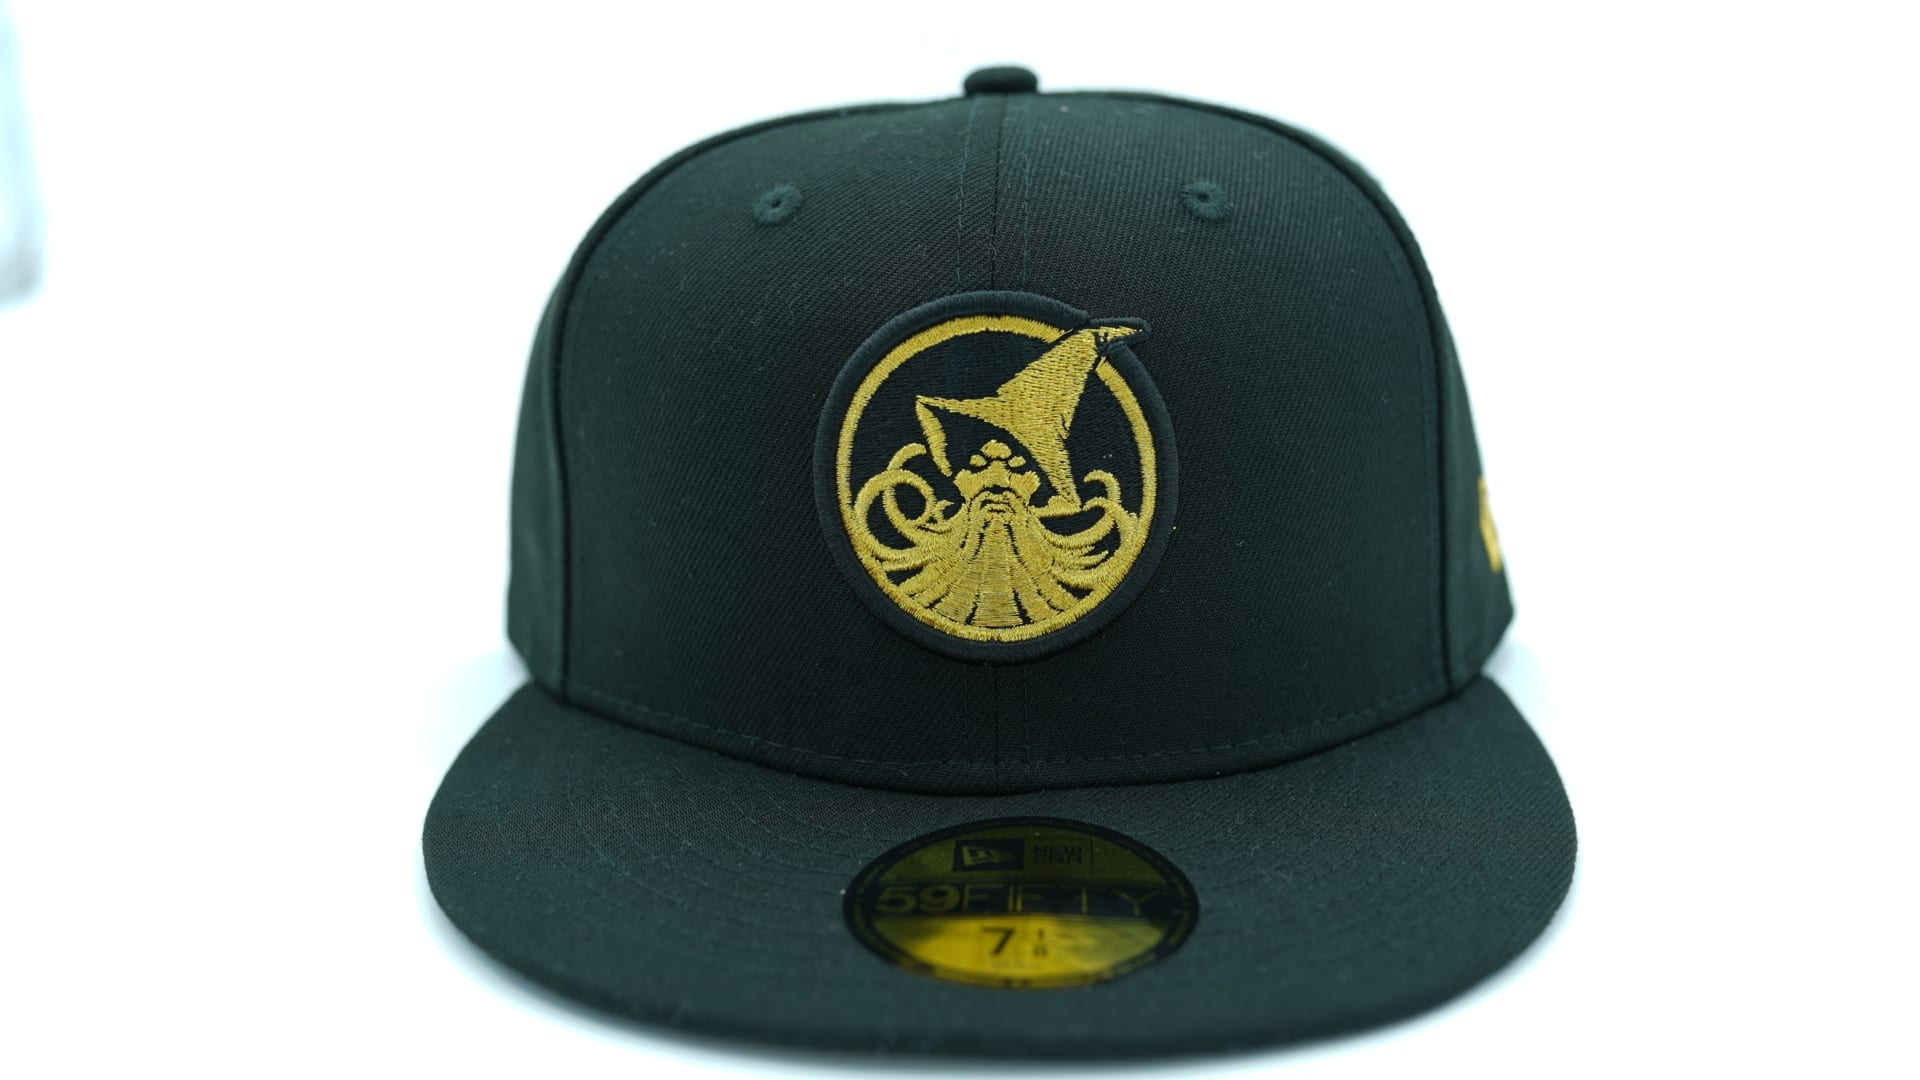 nike-sb-new-era-59Fifty-fitted-baseball-cap-hat